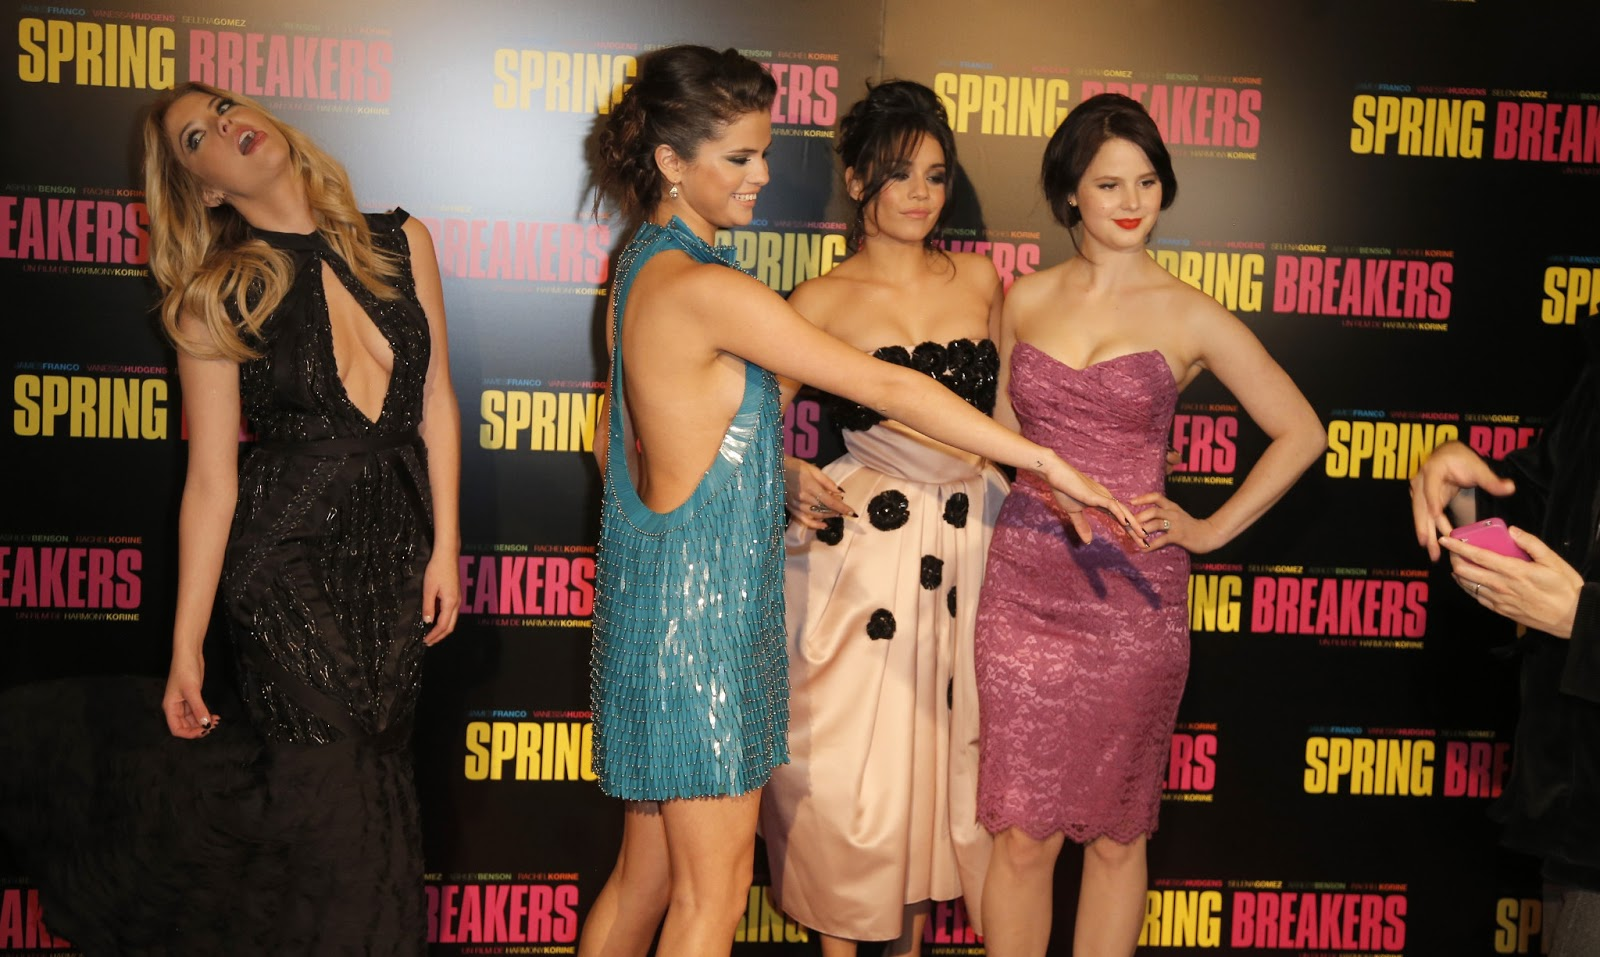 http://4.bp.blogspot.com/-rA3FhR01-p0/USNoCHMKmhI/AAAAAAAAKTc/zQDp2wYKwww/s1600/Selena+Gomez+attends+the+_Spring+Breakers_+Paris+Premiere+at+Le+Grand+Rex+on+February+18_+2013+_20_-.jpg